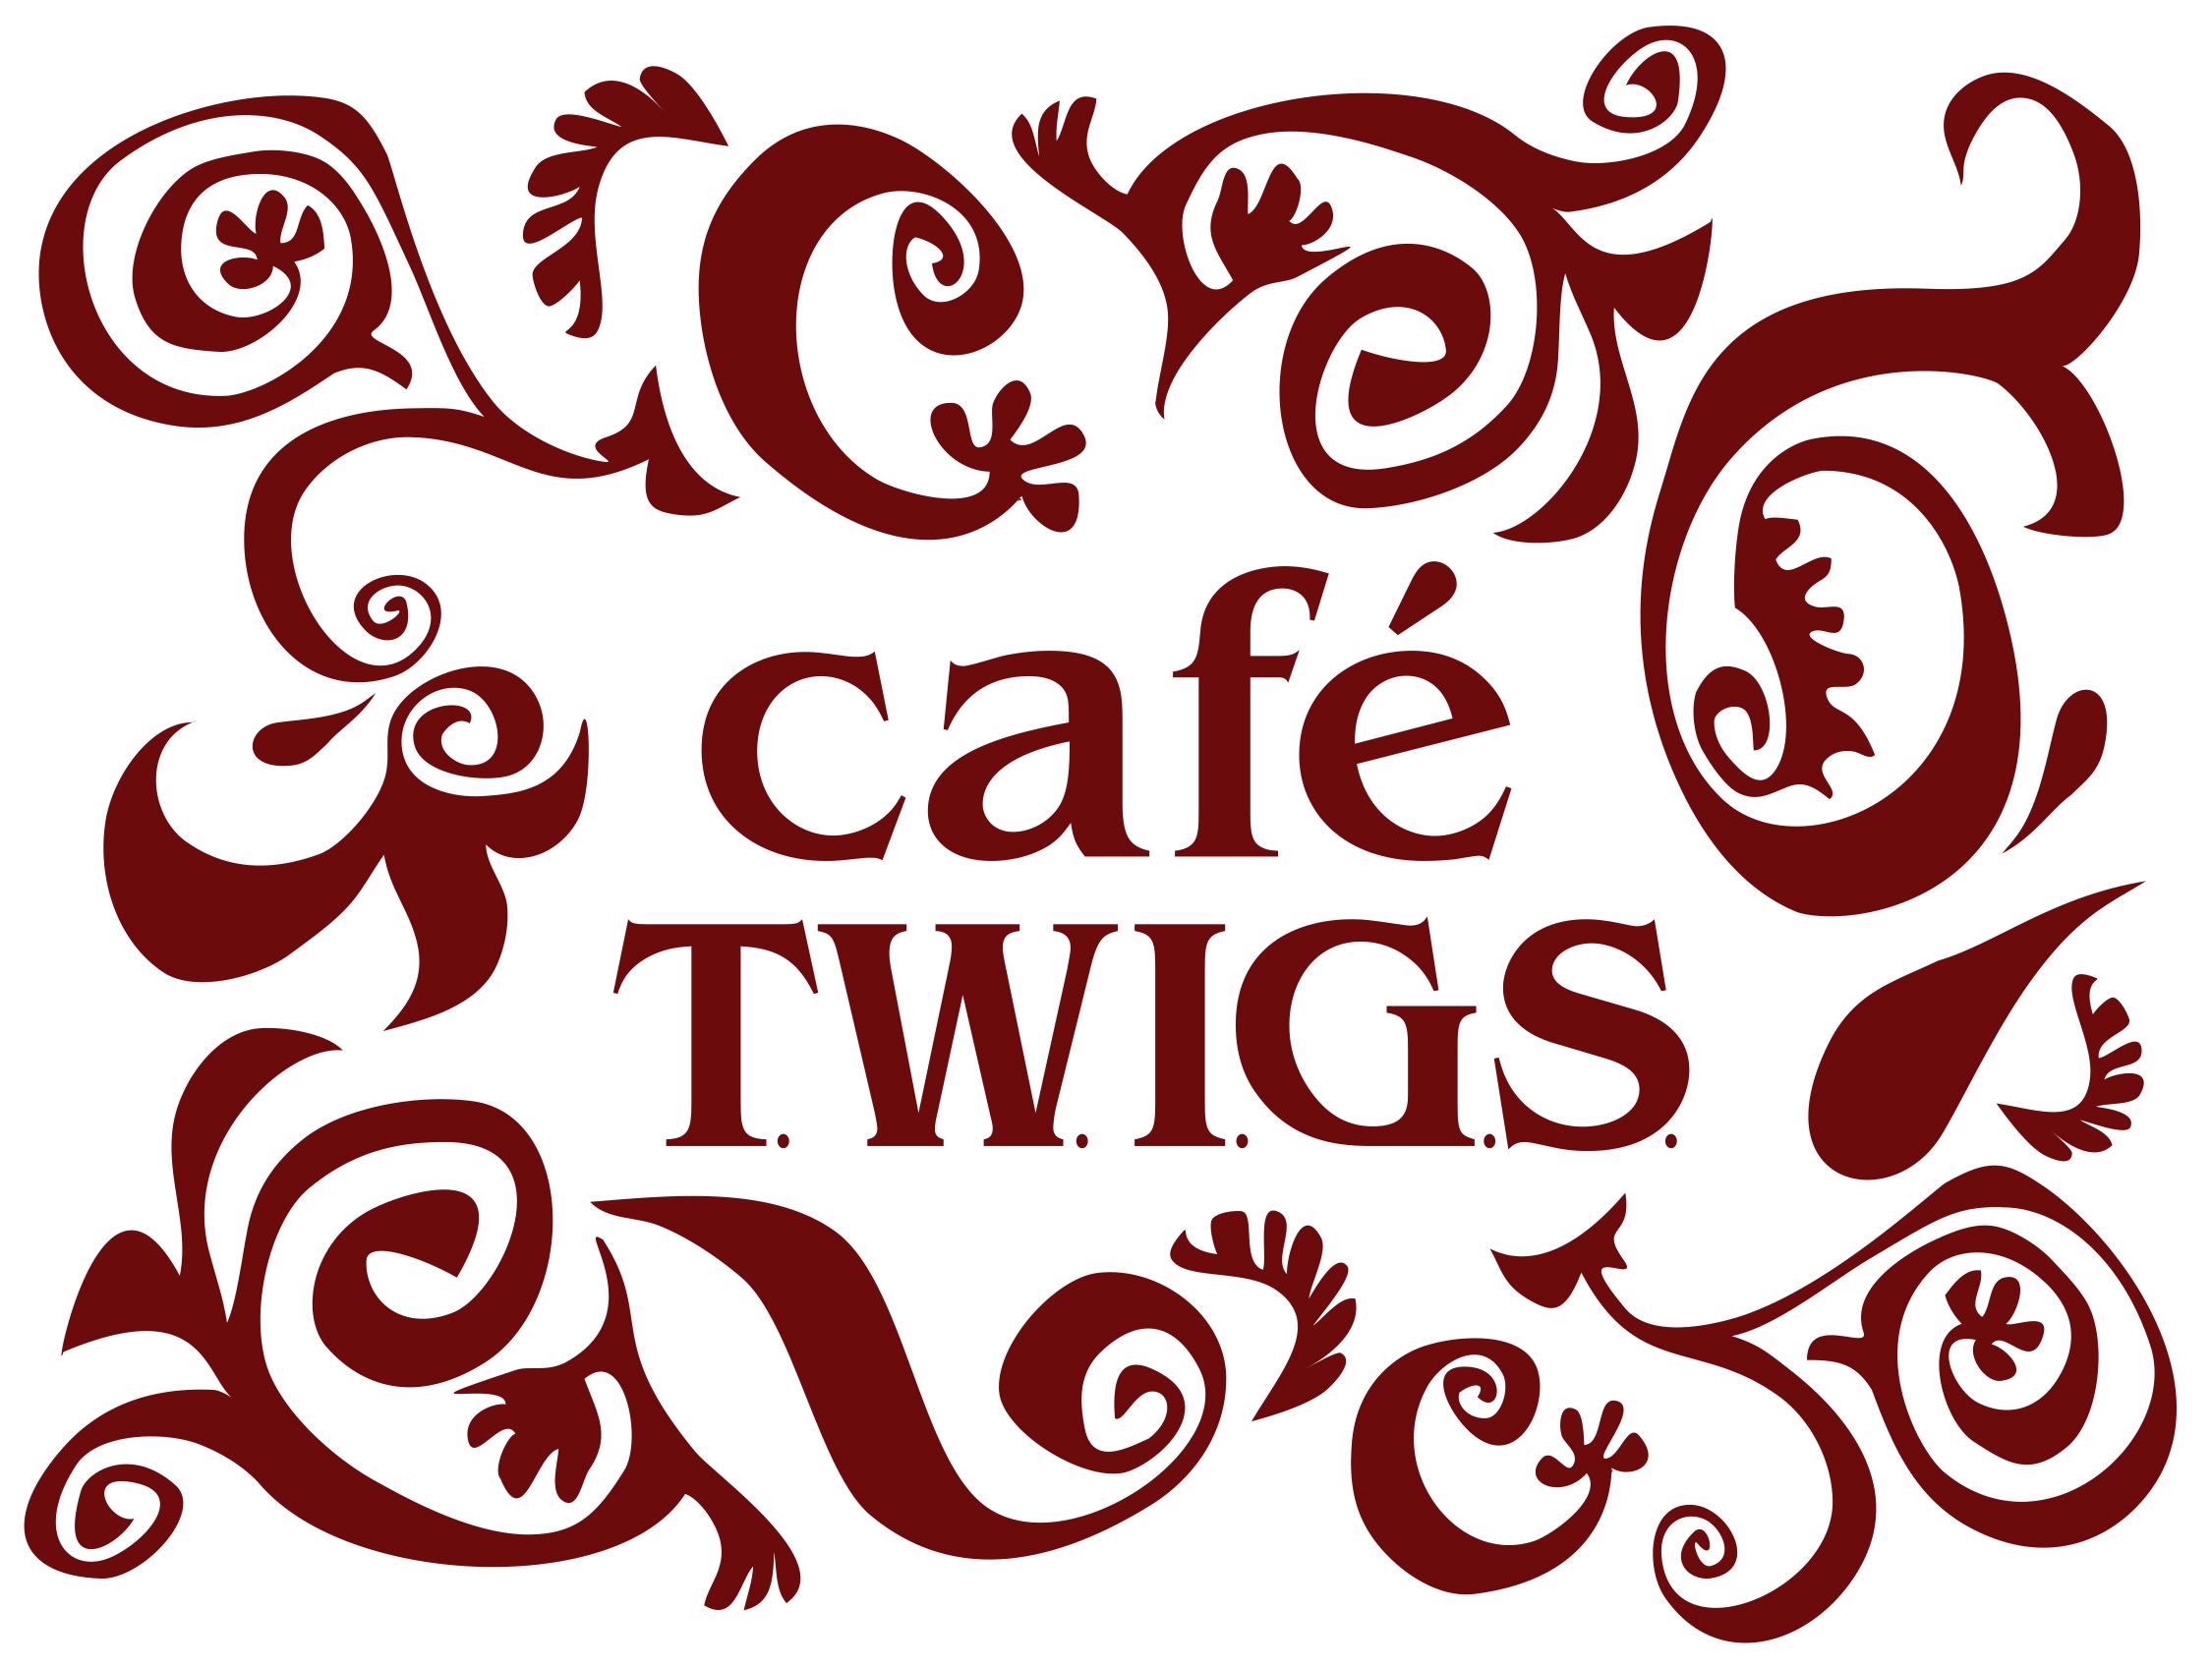 Café Twigs